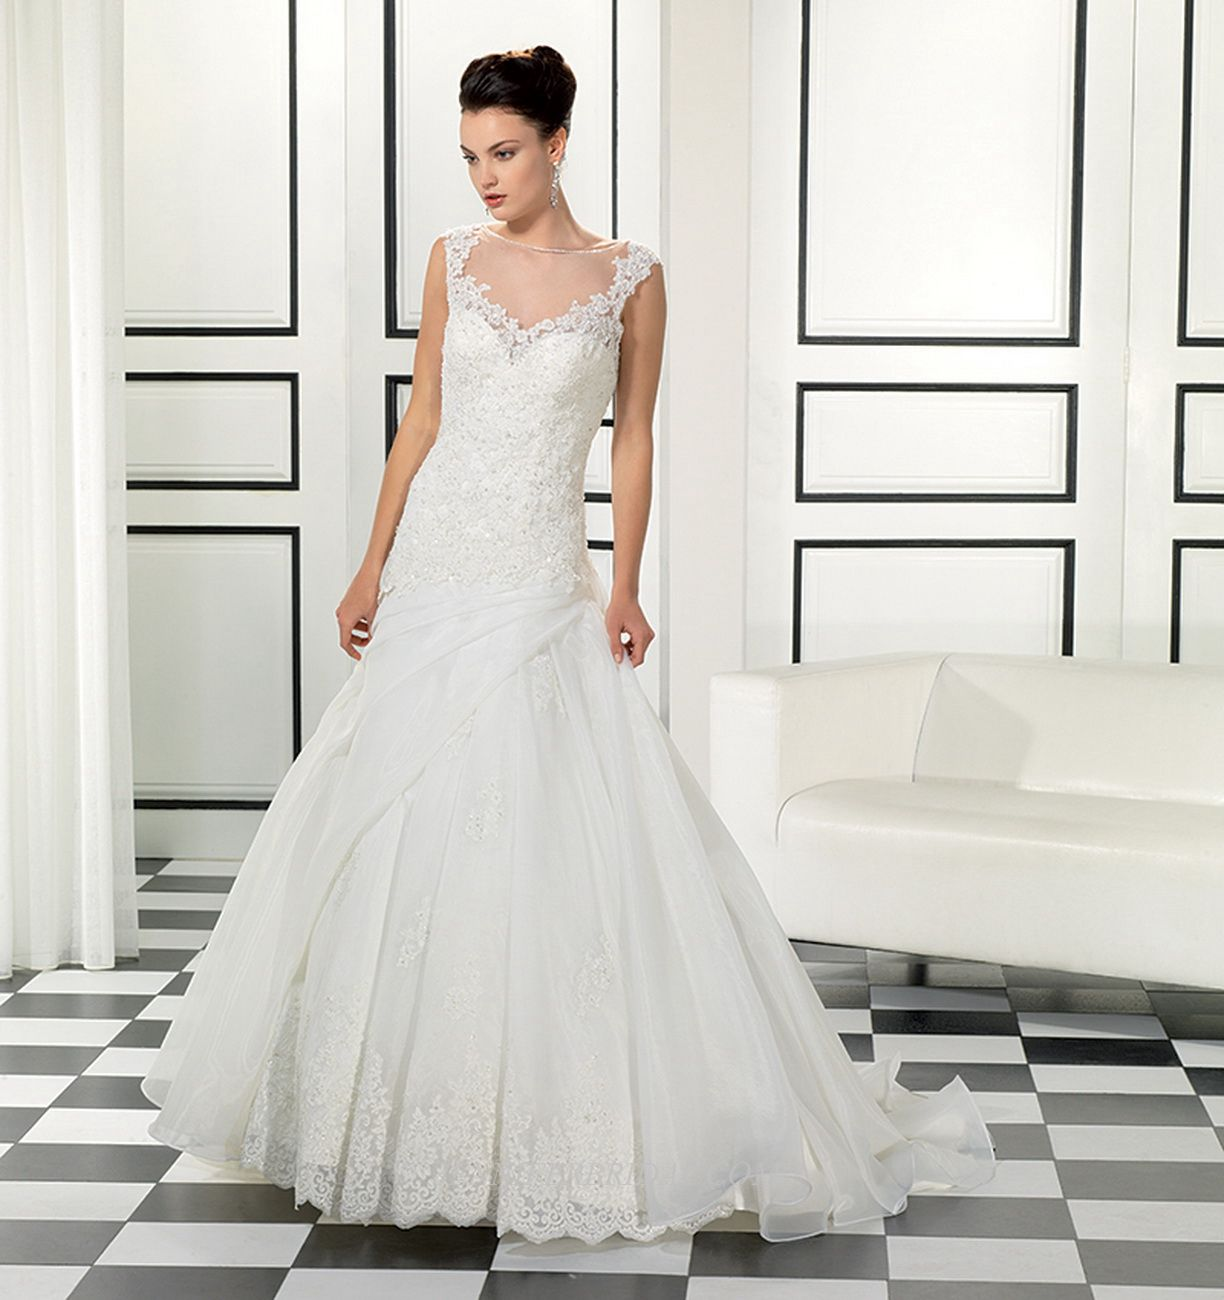 Eddy K Bridal Gown Style - Ek971 | Wedding | Pinterest | Bridal gown ...